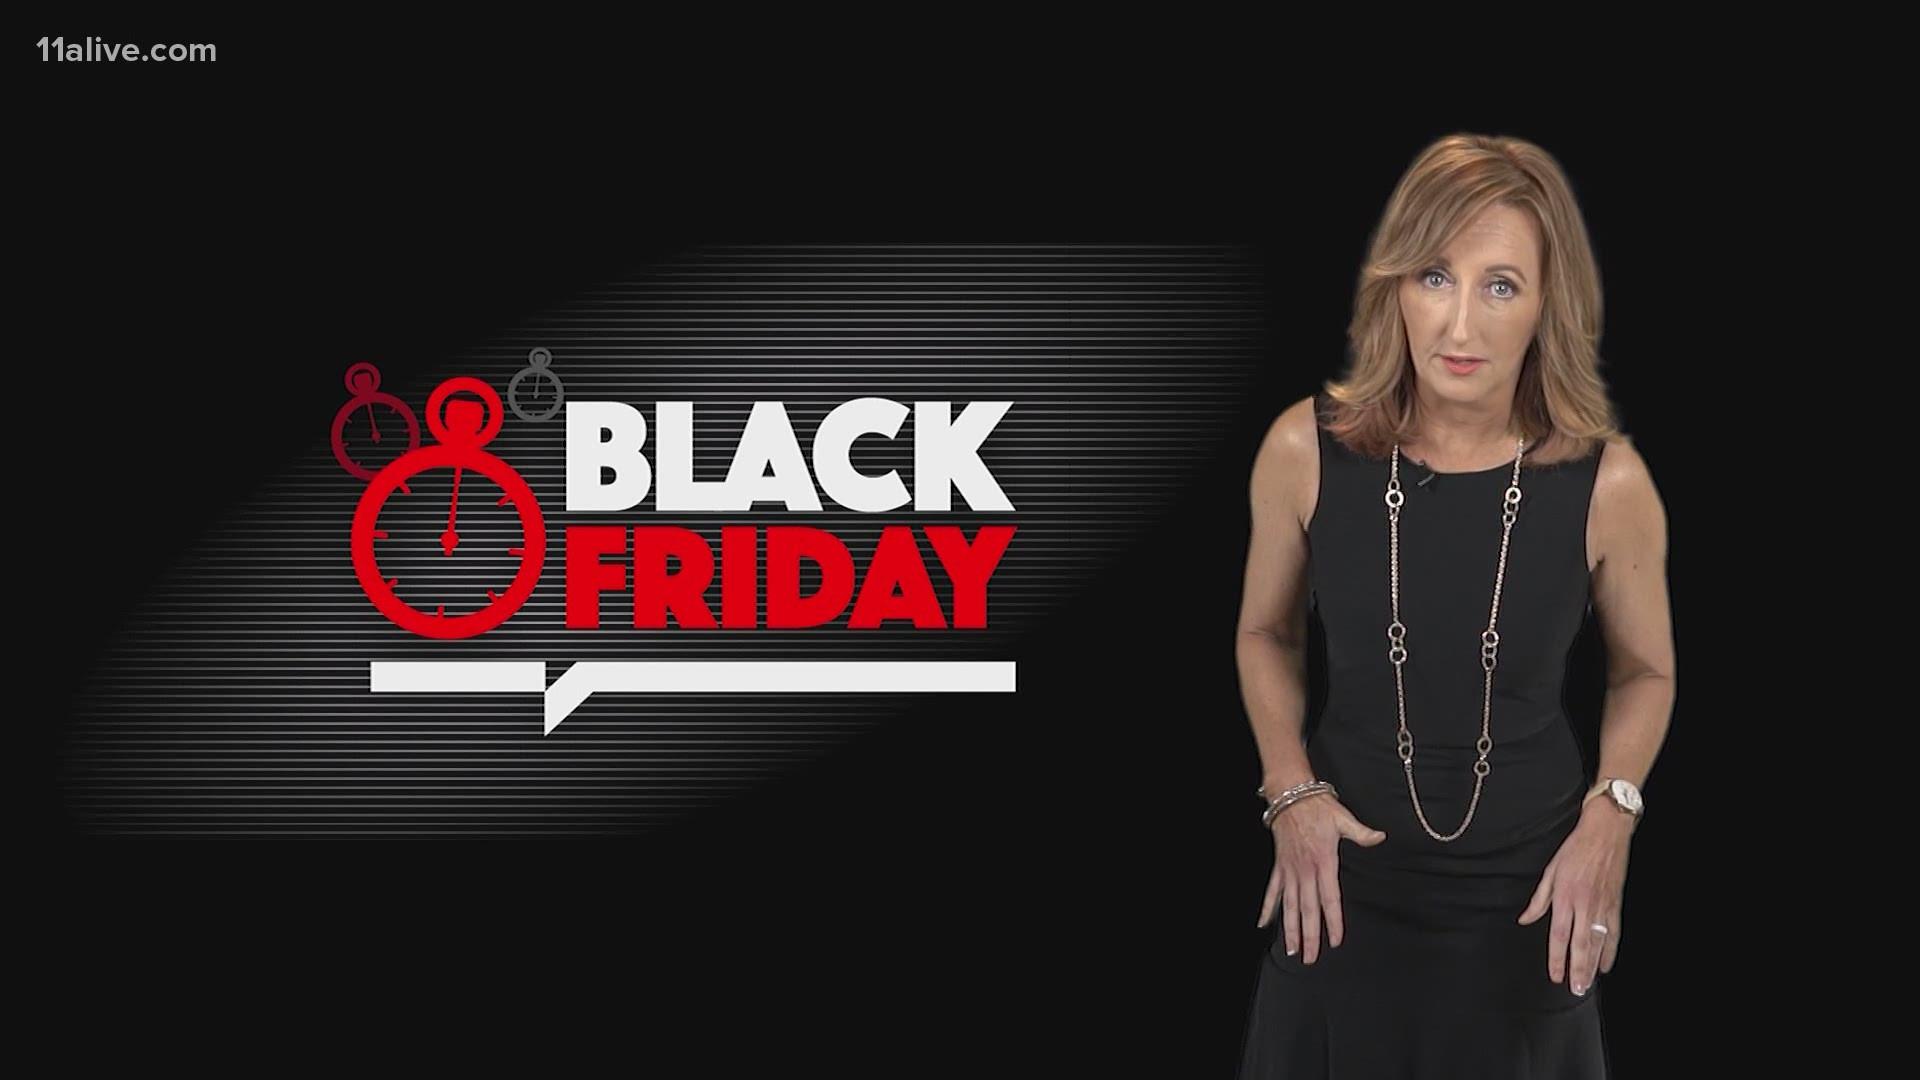 Target Black Friday Ad 2020 Deals Kick Off Sunday 13newsnow Com